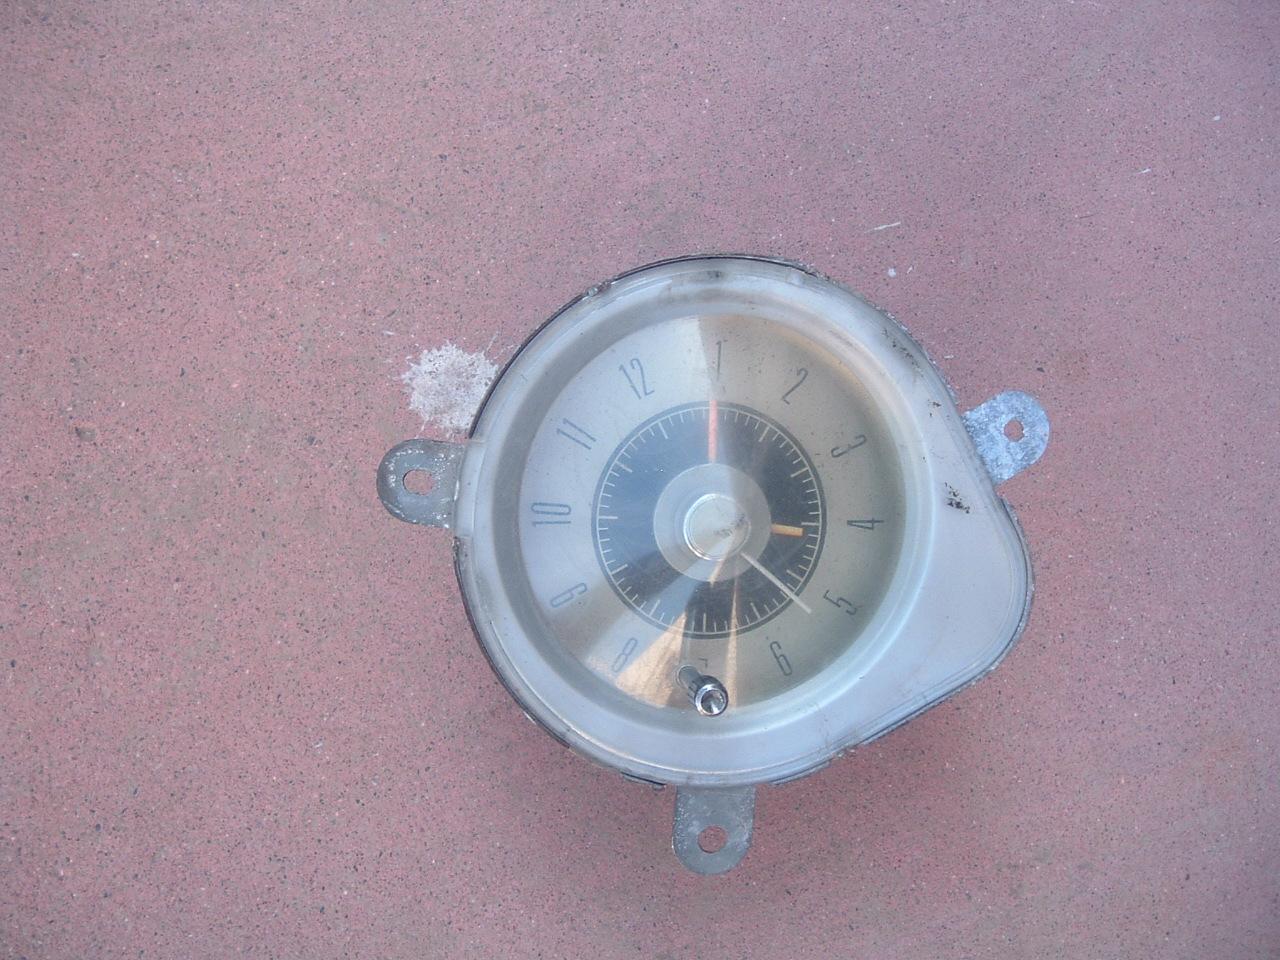 1968 69 ford fairlane torino dash clock original ford (z 68-9torino clock)